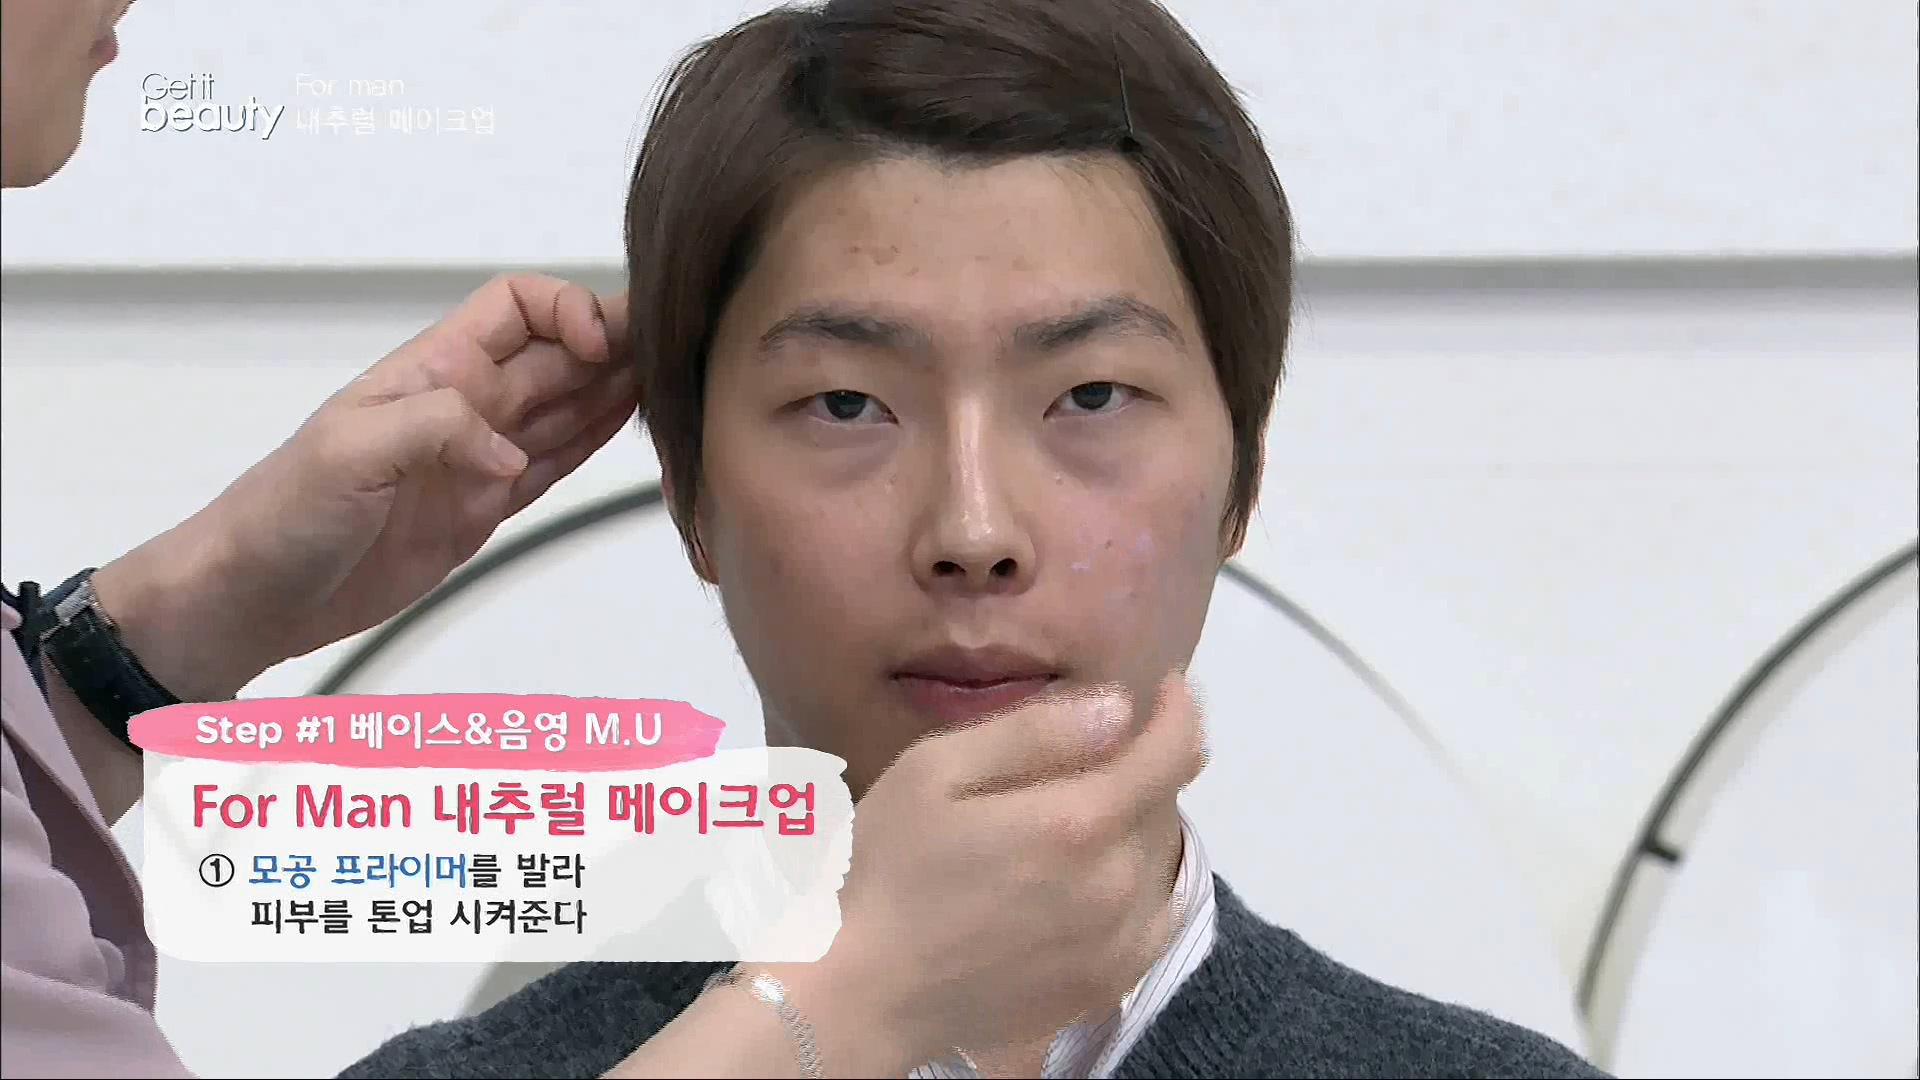 Step#1.베이스&음영 M.U 1.모공 프라이머를 발라 피부를 톤업 시켜준다.